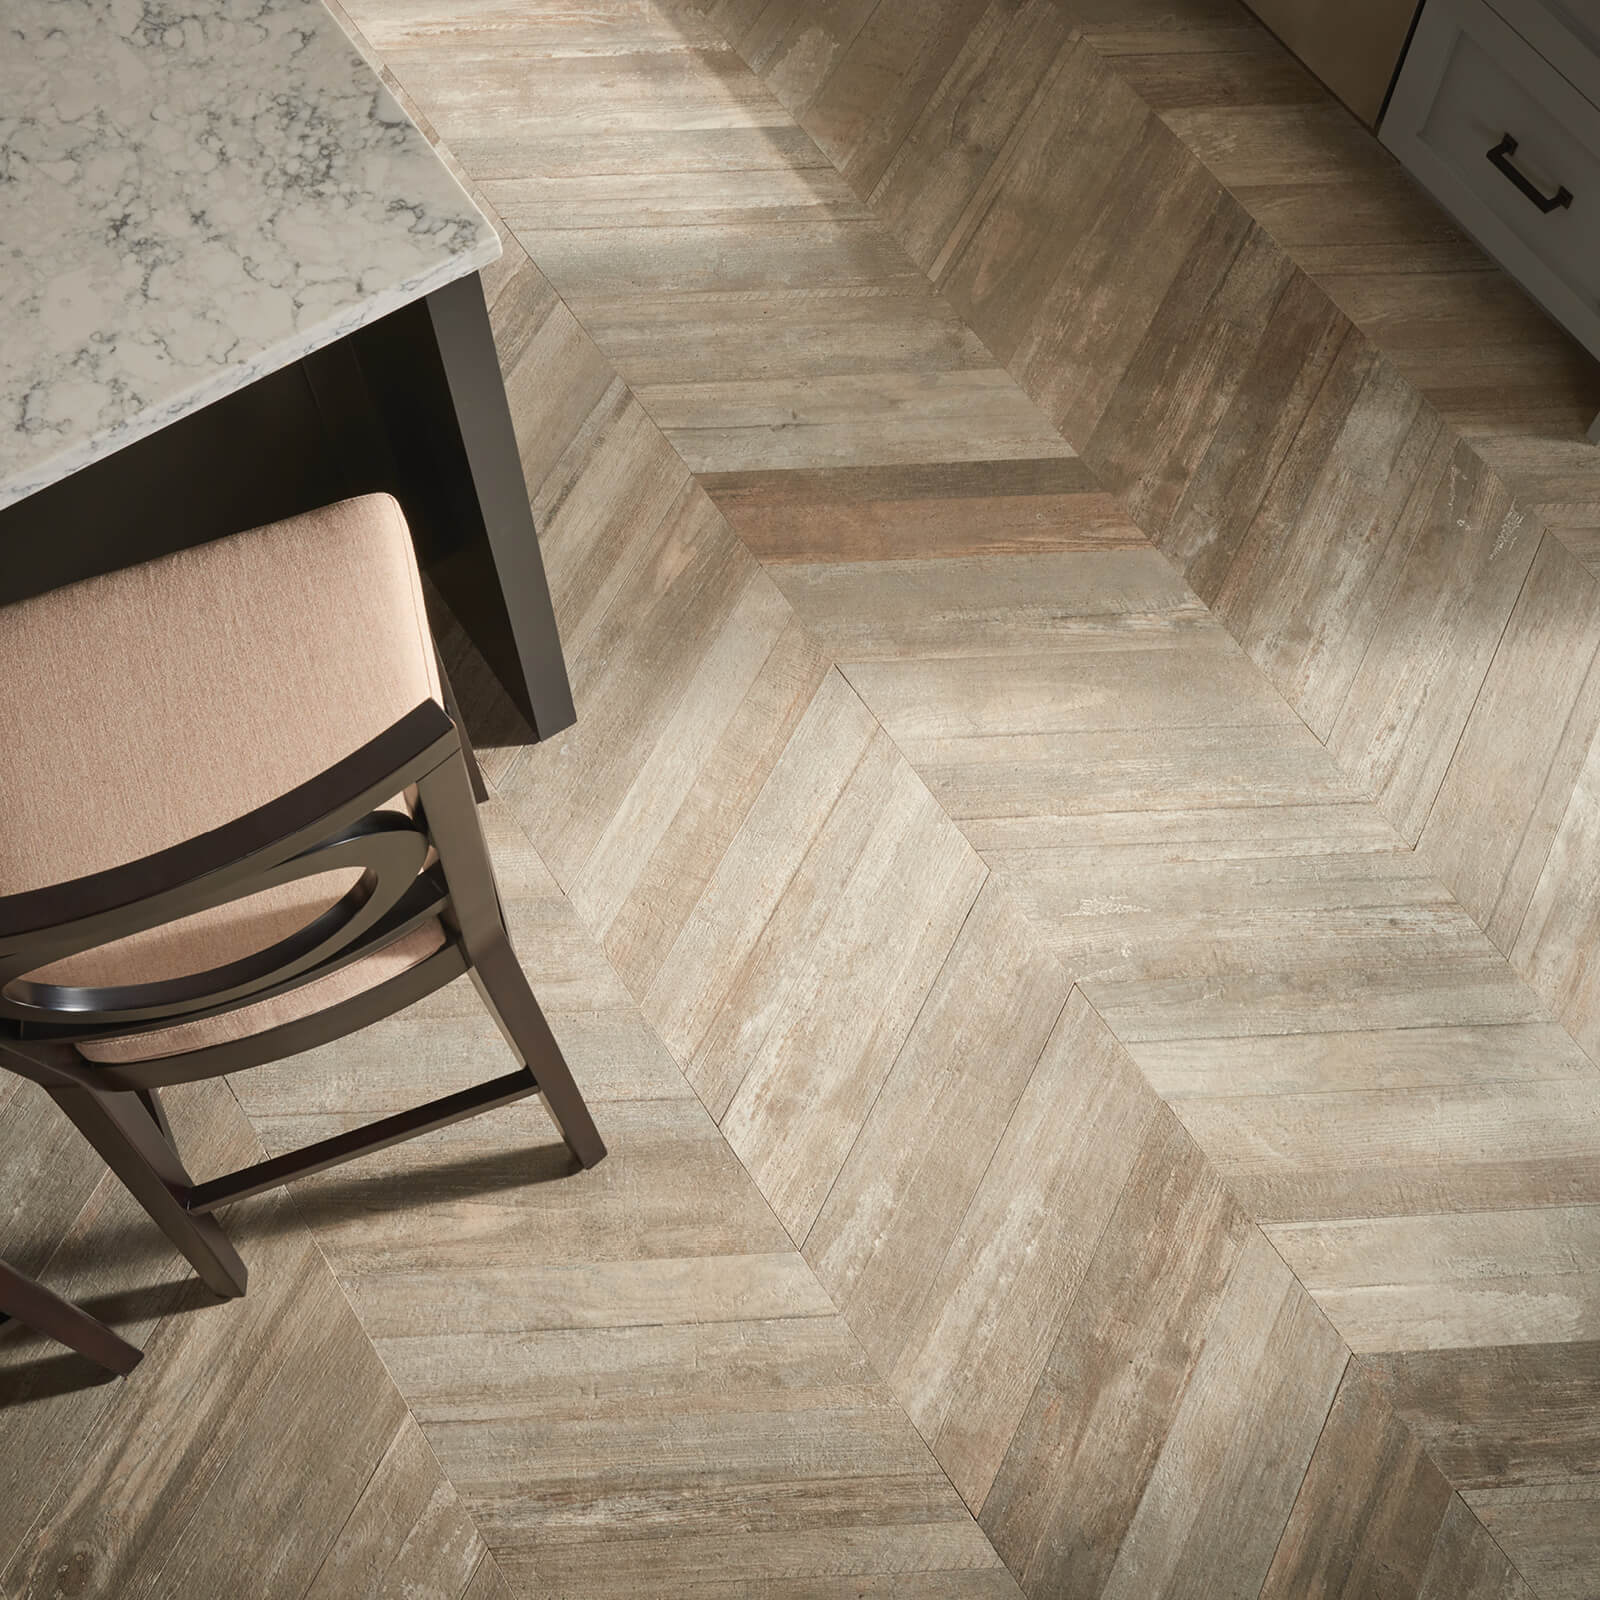 Tiles | McSwain Carpet & Floors